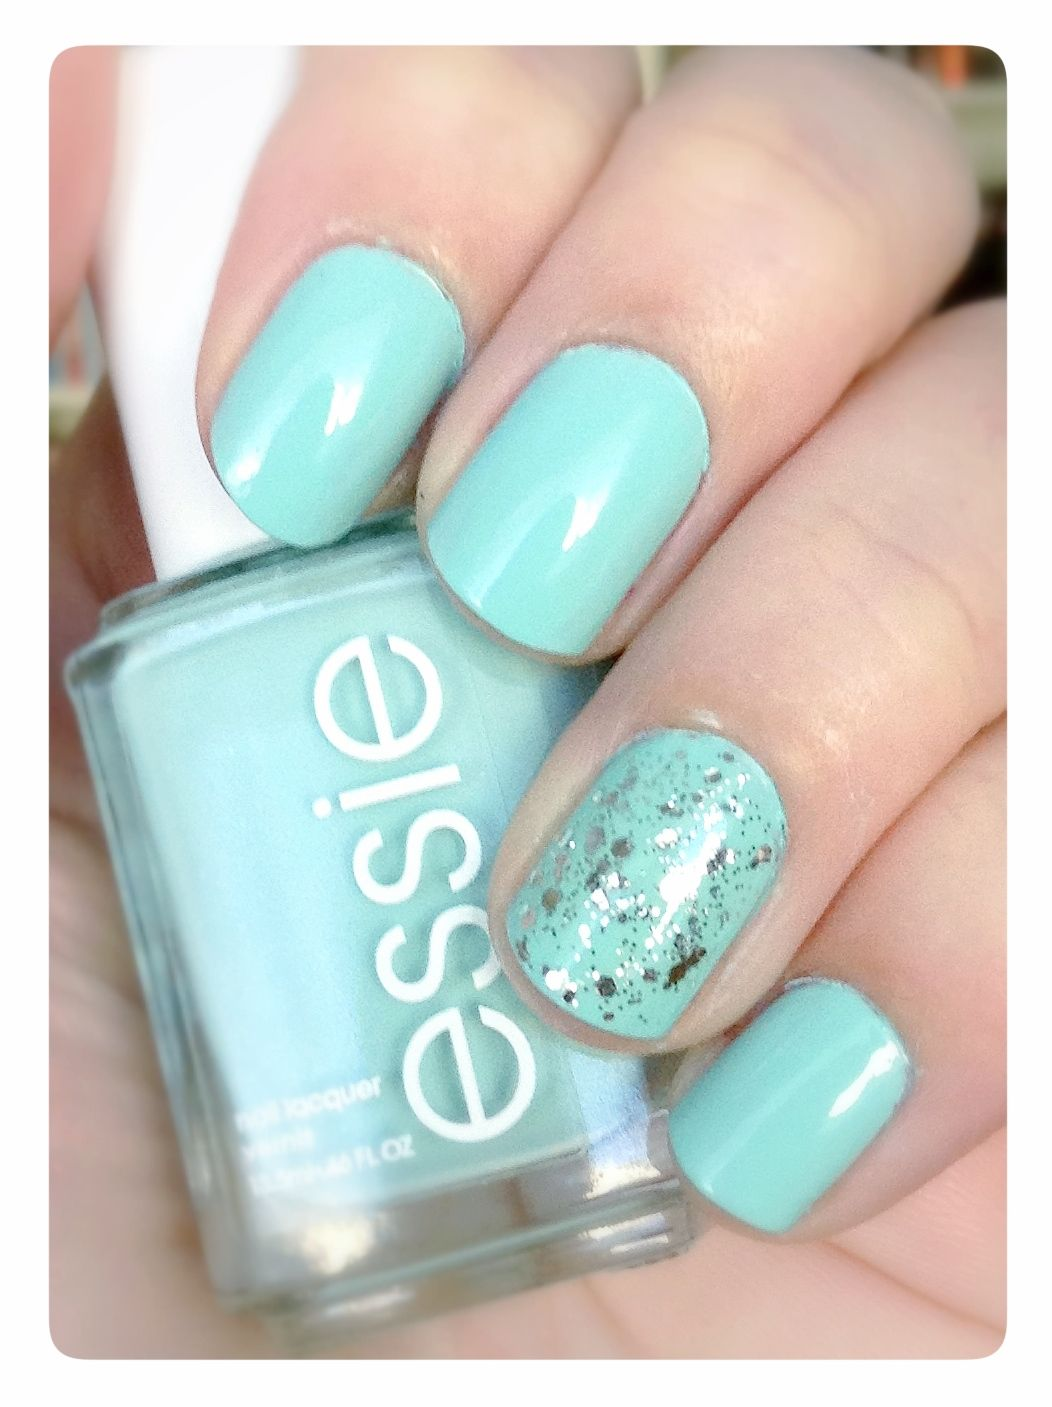 essie nails tumblr - Google Search | Fashion | Pinterest ...